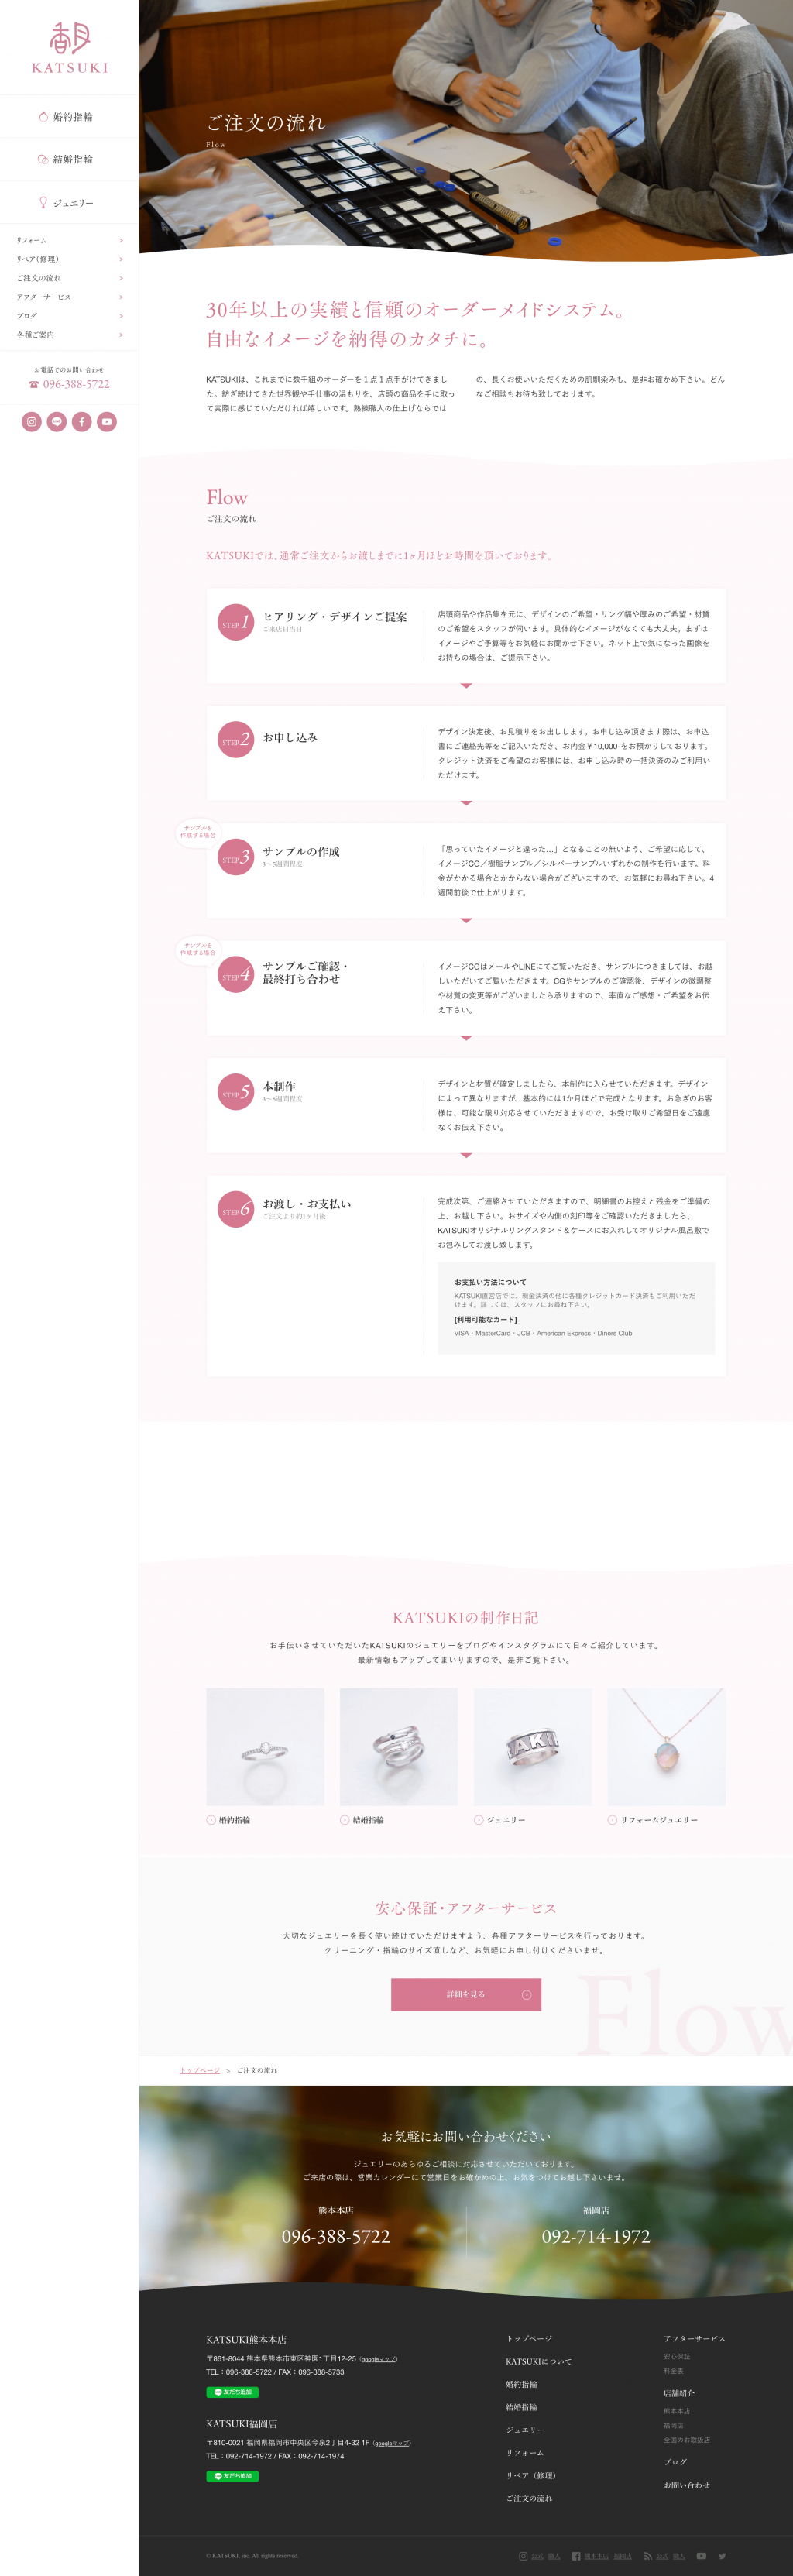 KATSUKIサイトのパソコン表示